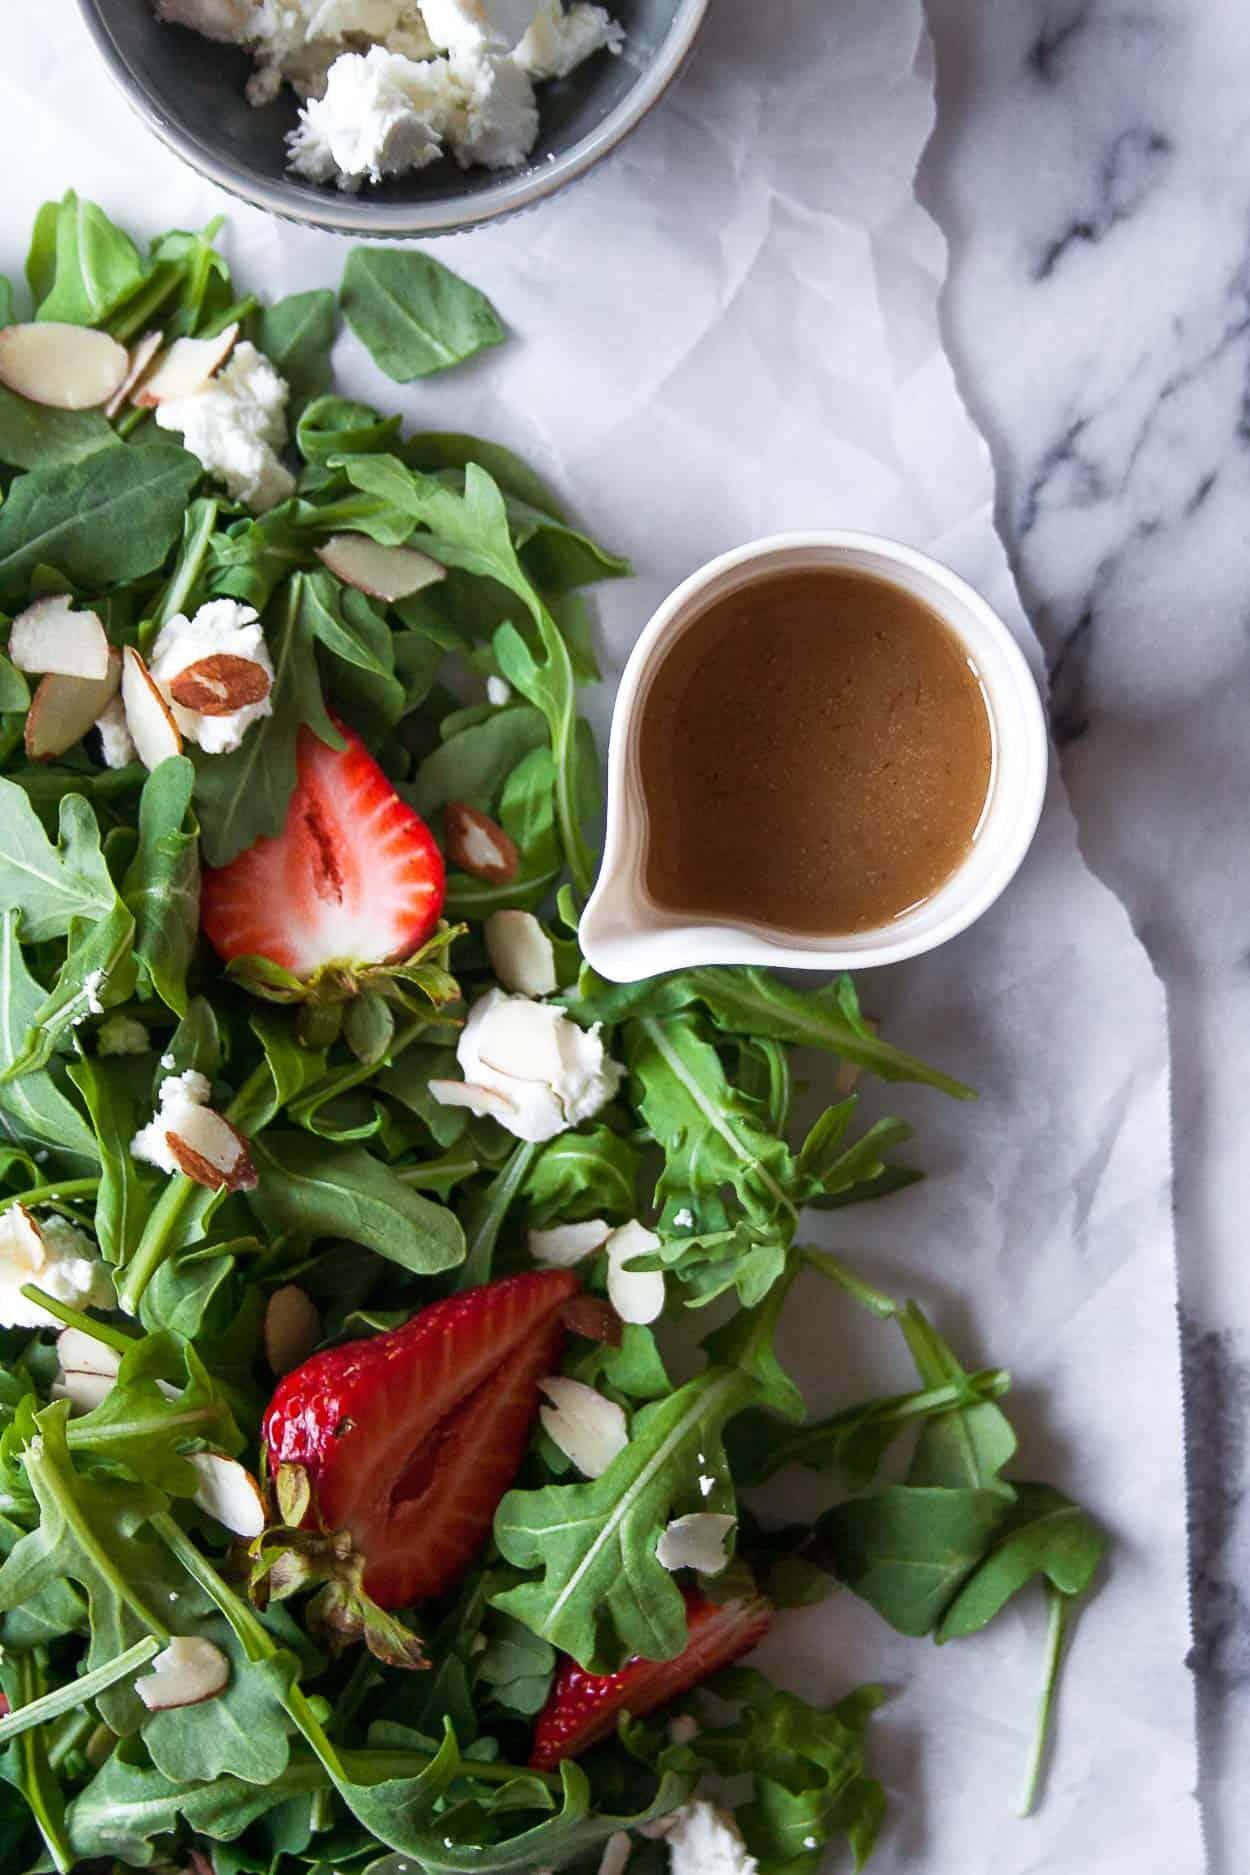 Strawberry Goat Cheese Salad with Green Goddess Vinaigrette | #dressing #almonds #arugula #summer #recipe #BBQ #goatcheese #paleo | www.hungrybynature.com